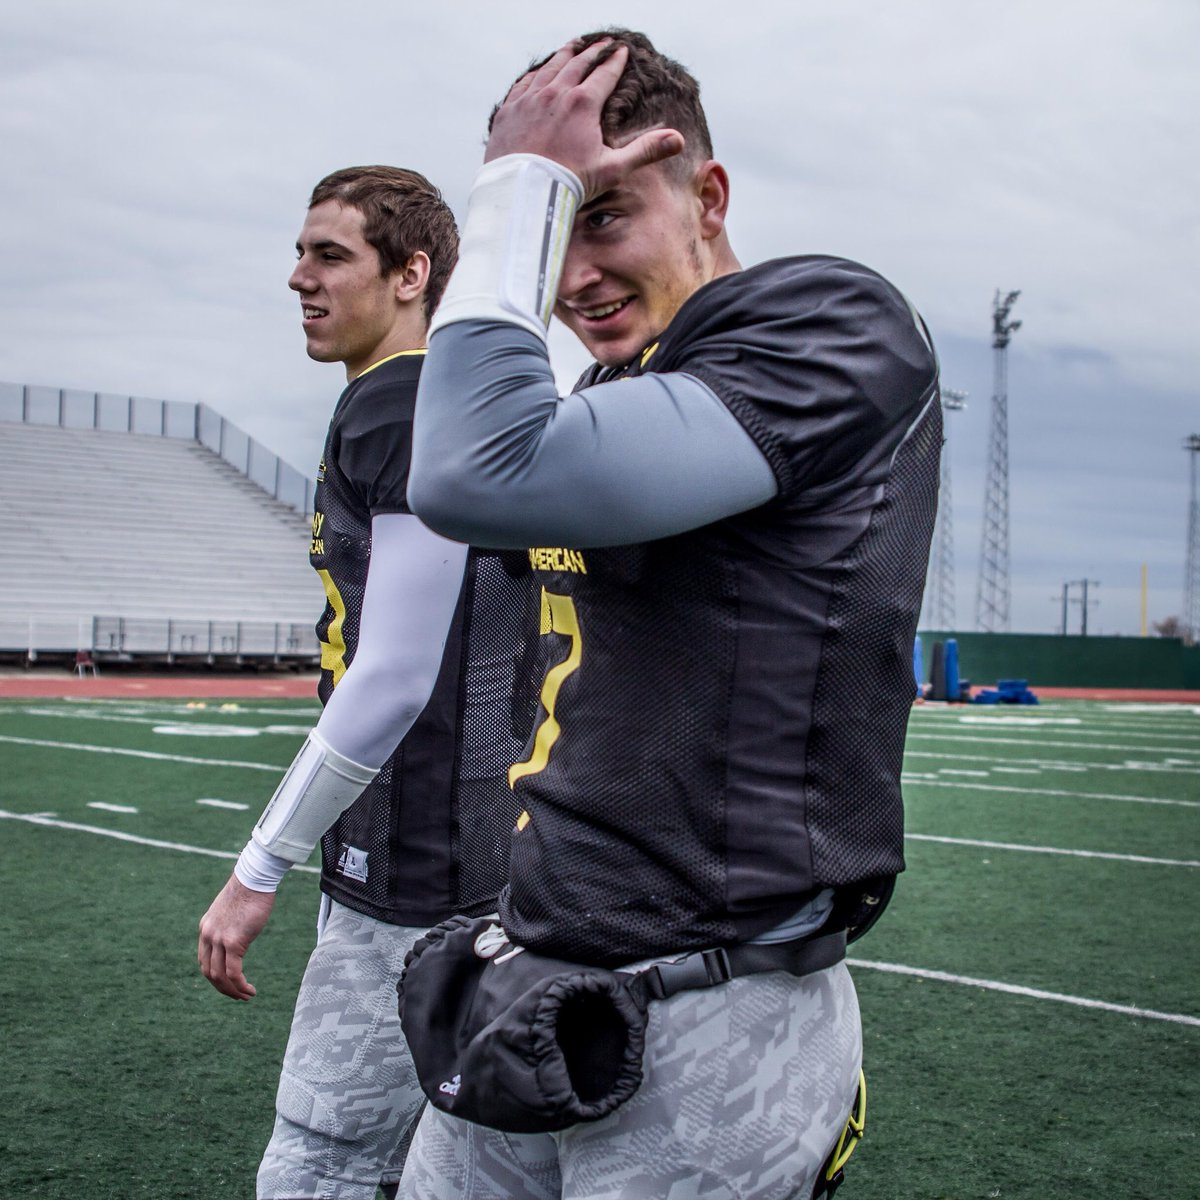 Michigan Football: A Quarterback Away from aChampionship?